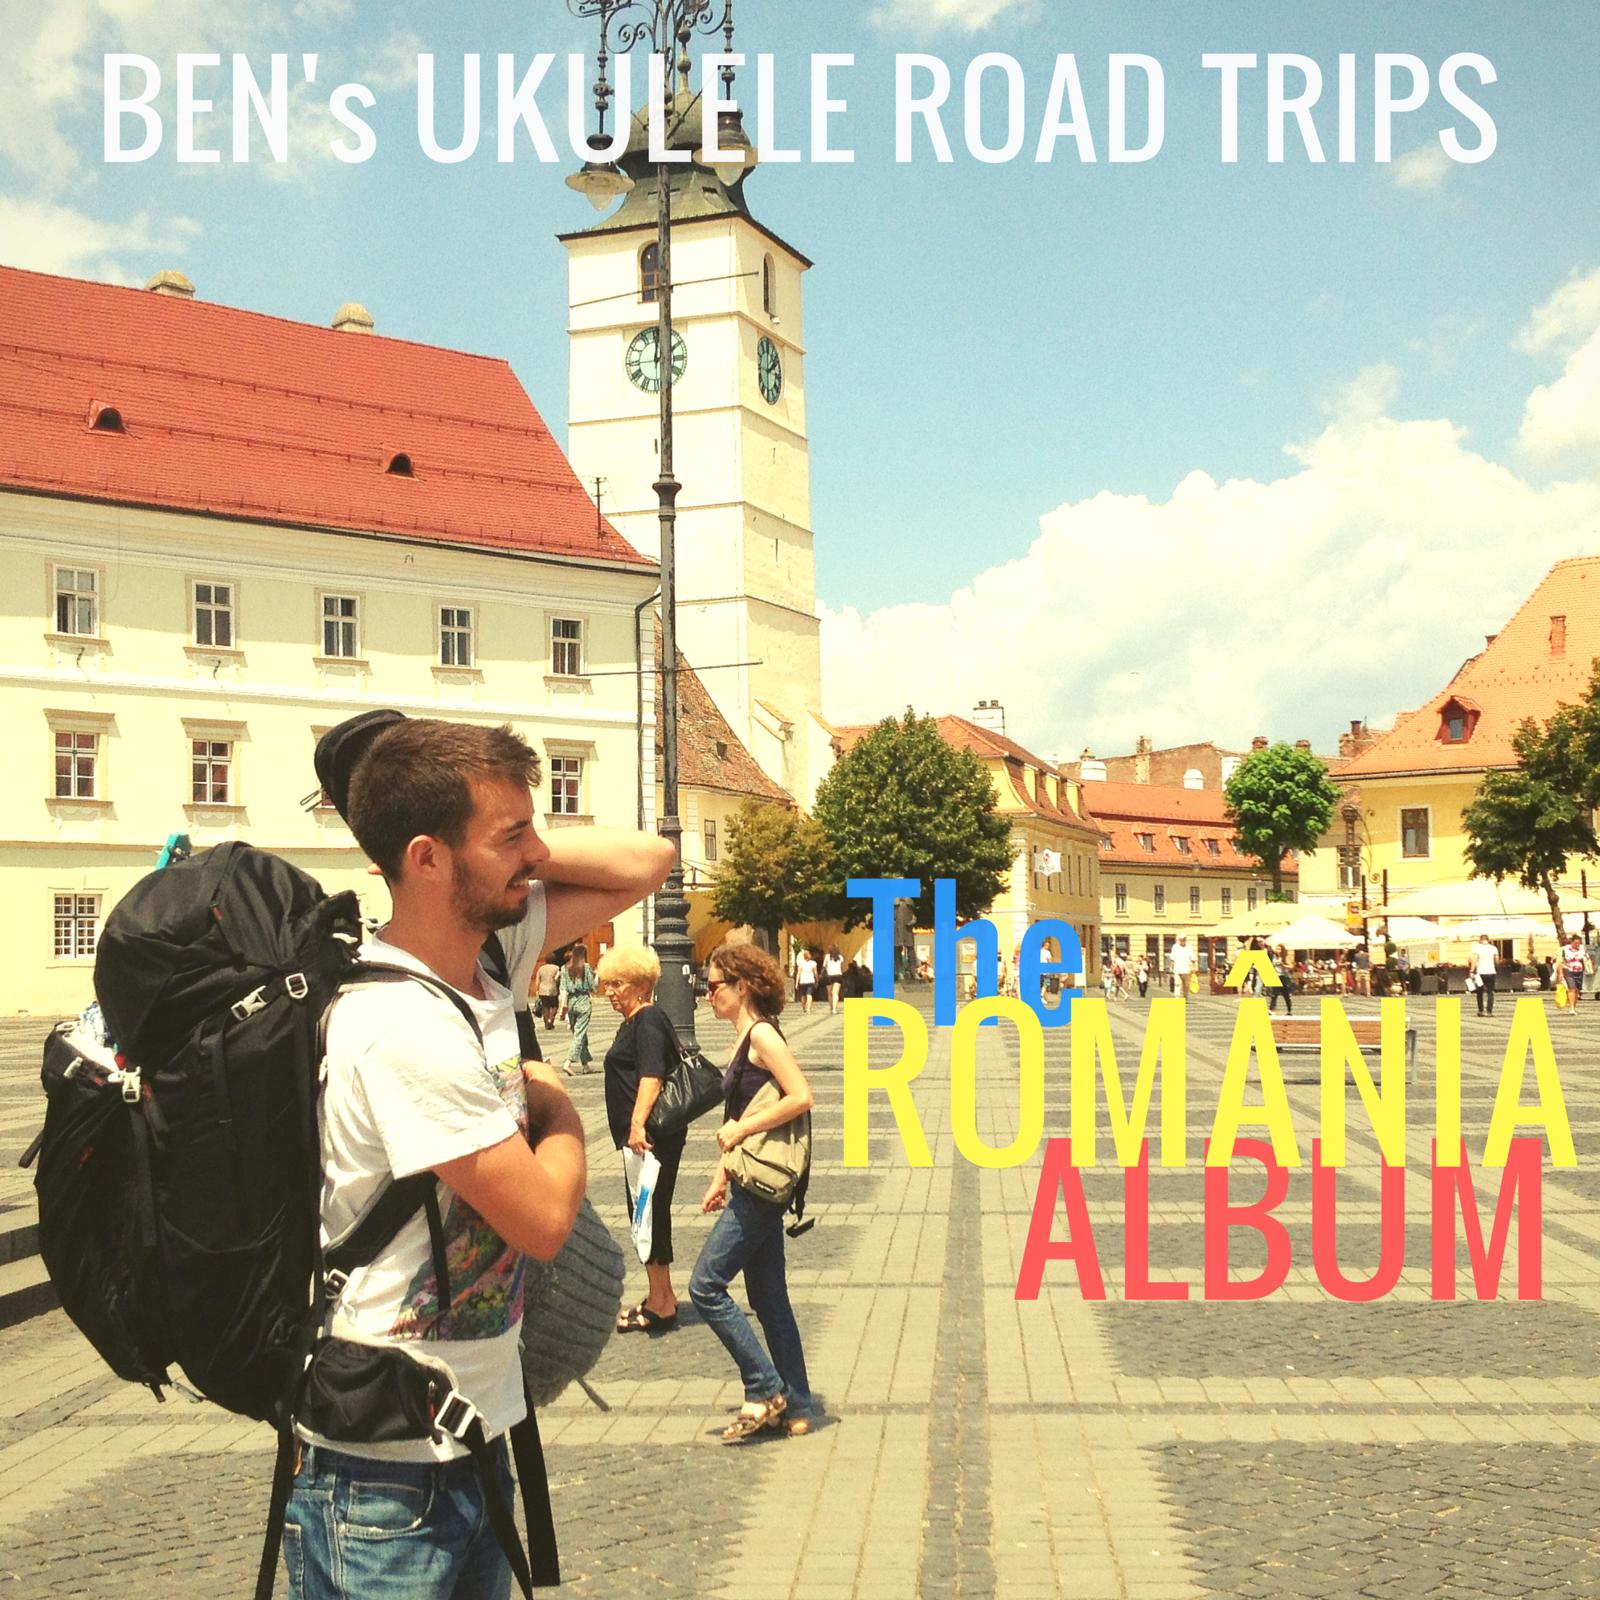 LISTEN TO 'THE ROMÂNIA ALBUM'